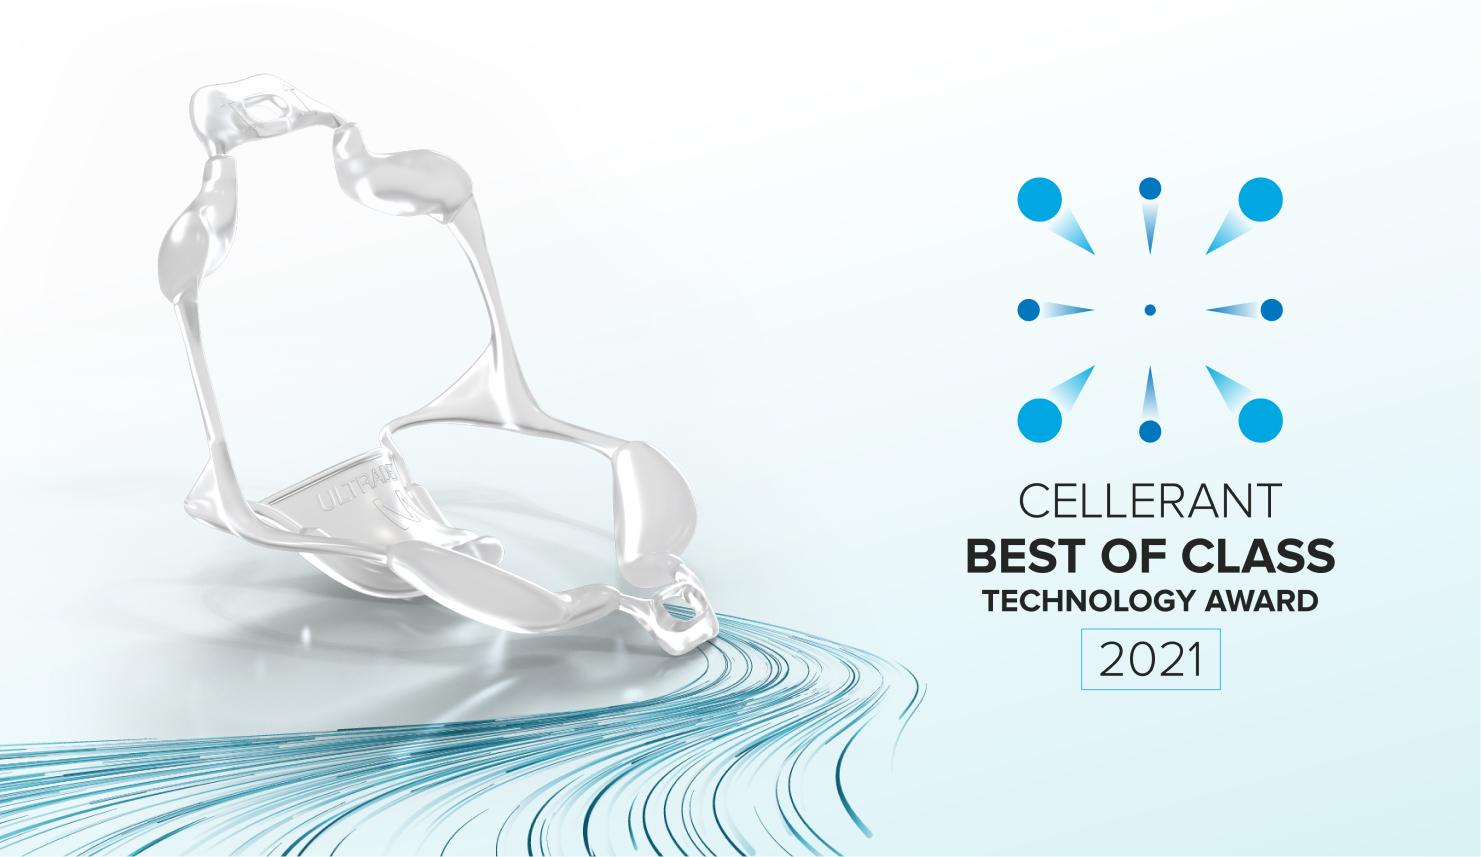 Umbrella Technology Award